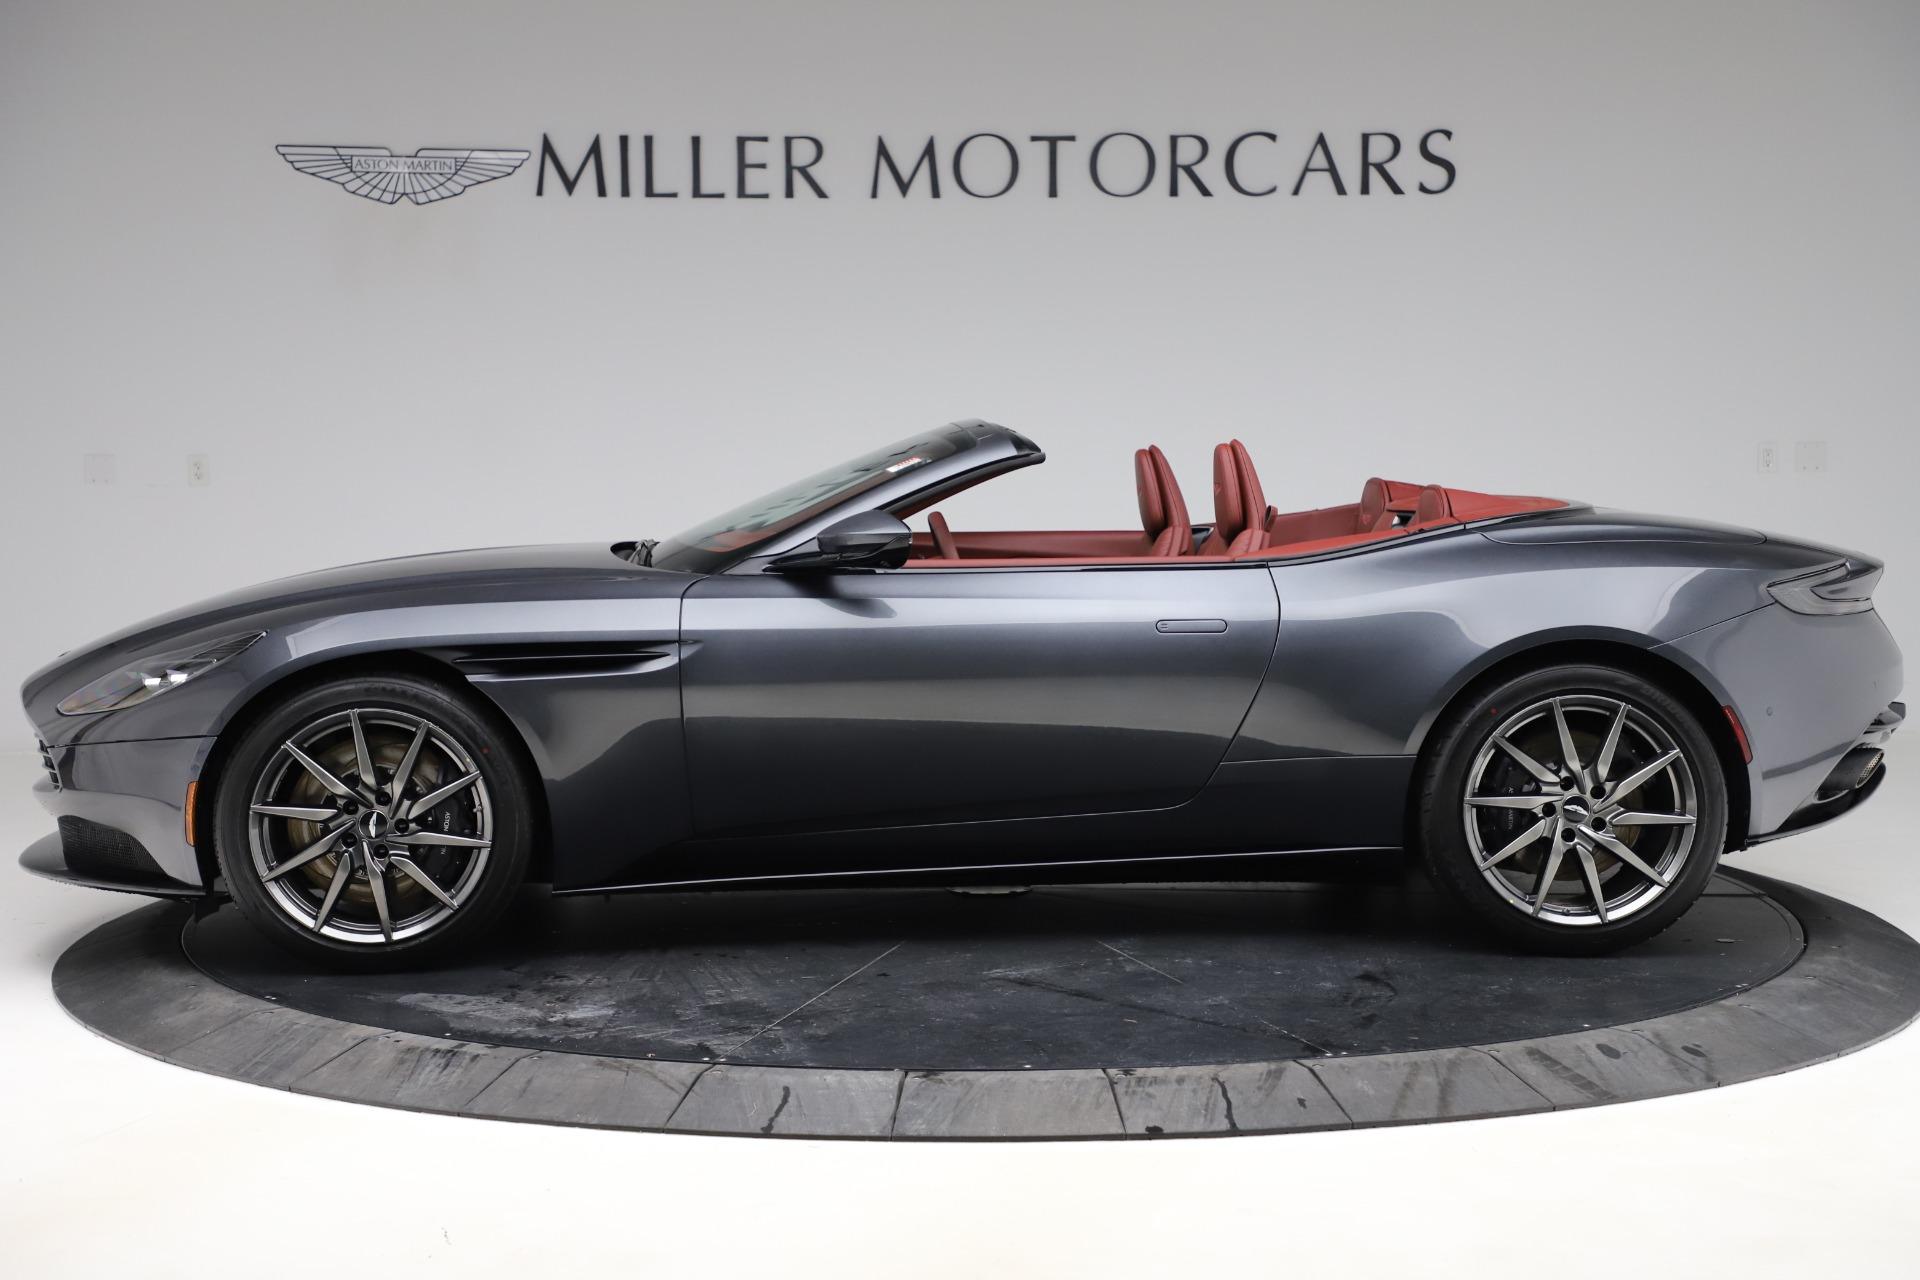 New 2020 Aston Martin Db11 Volante Convertible For Sale Special Pricing Aston Martin Of Greenwich Stock A1442